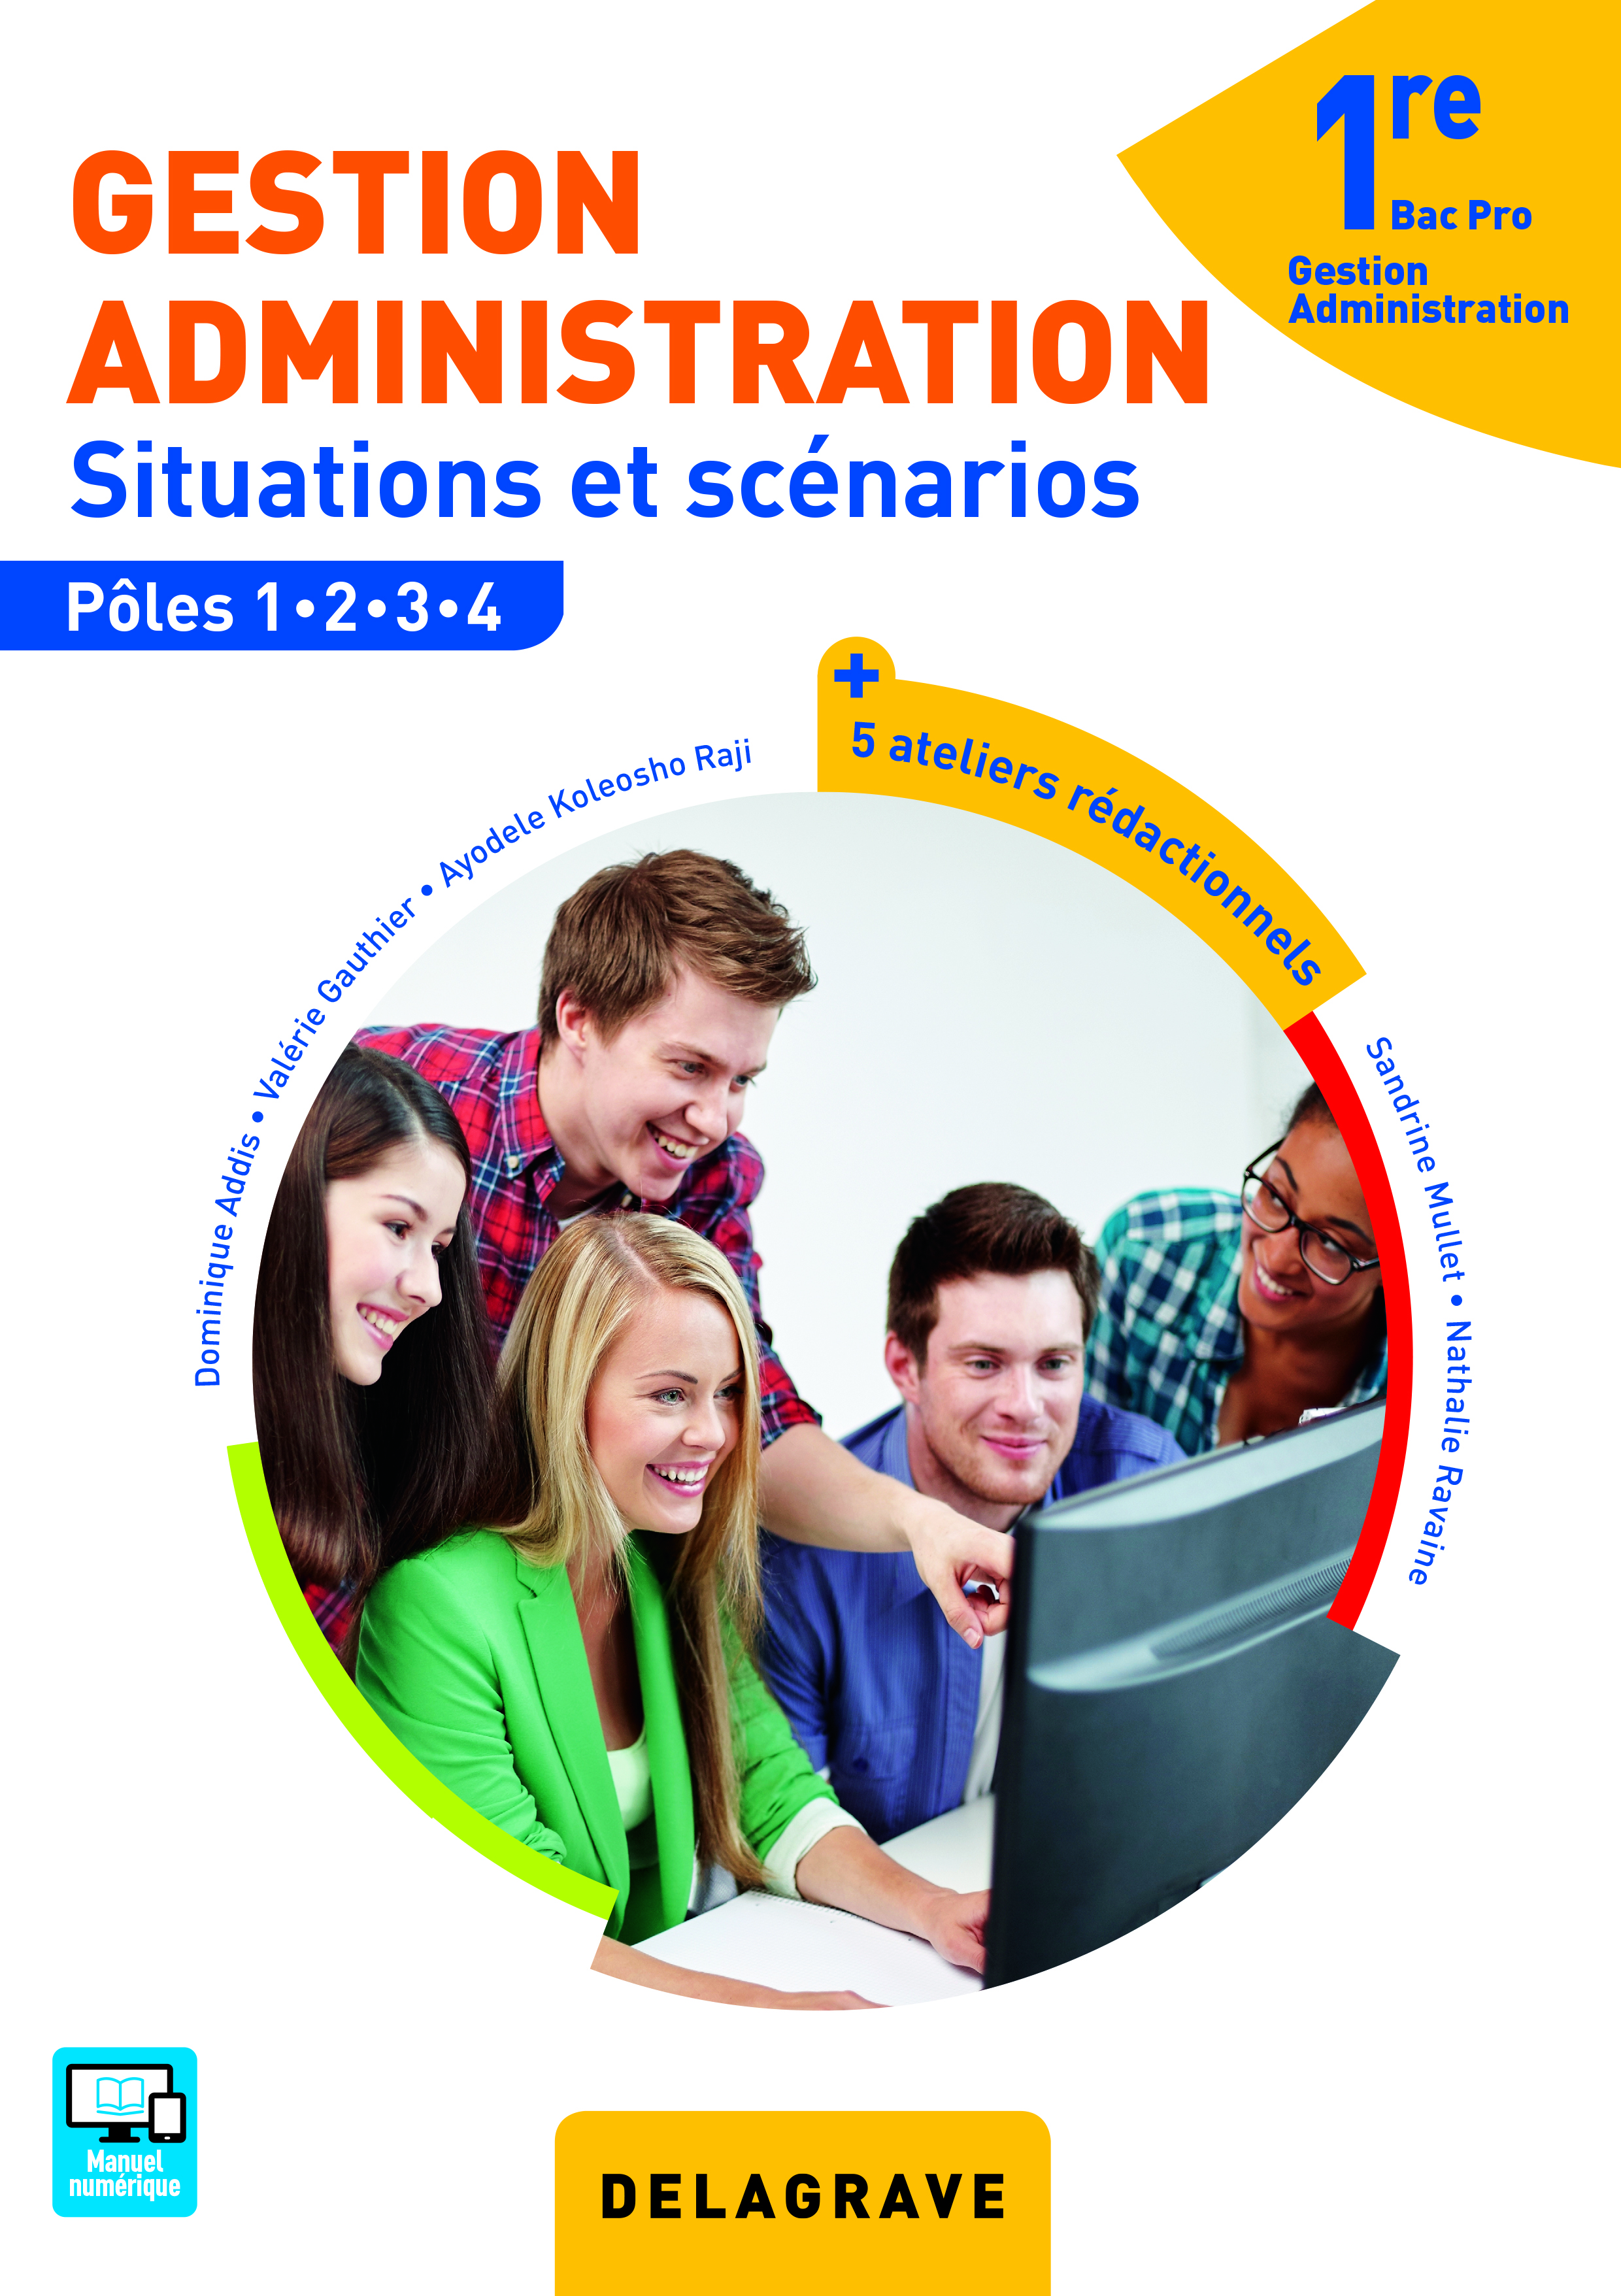 GESTION ADMINISTRATION 1E BAC PRO GA ELEVE SITUATIONS ET SCENARIOS POLES 1234